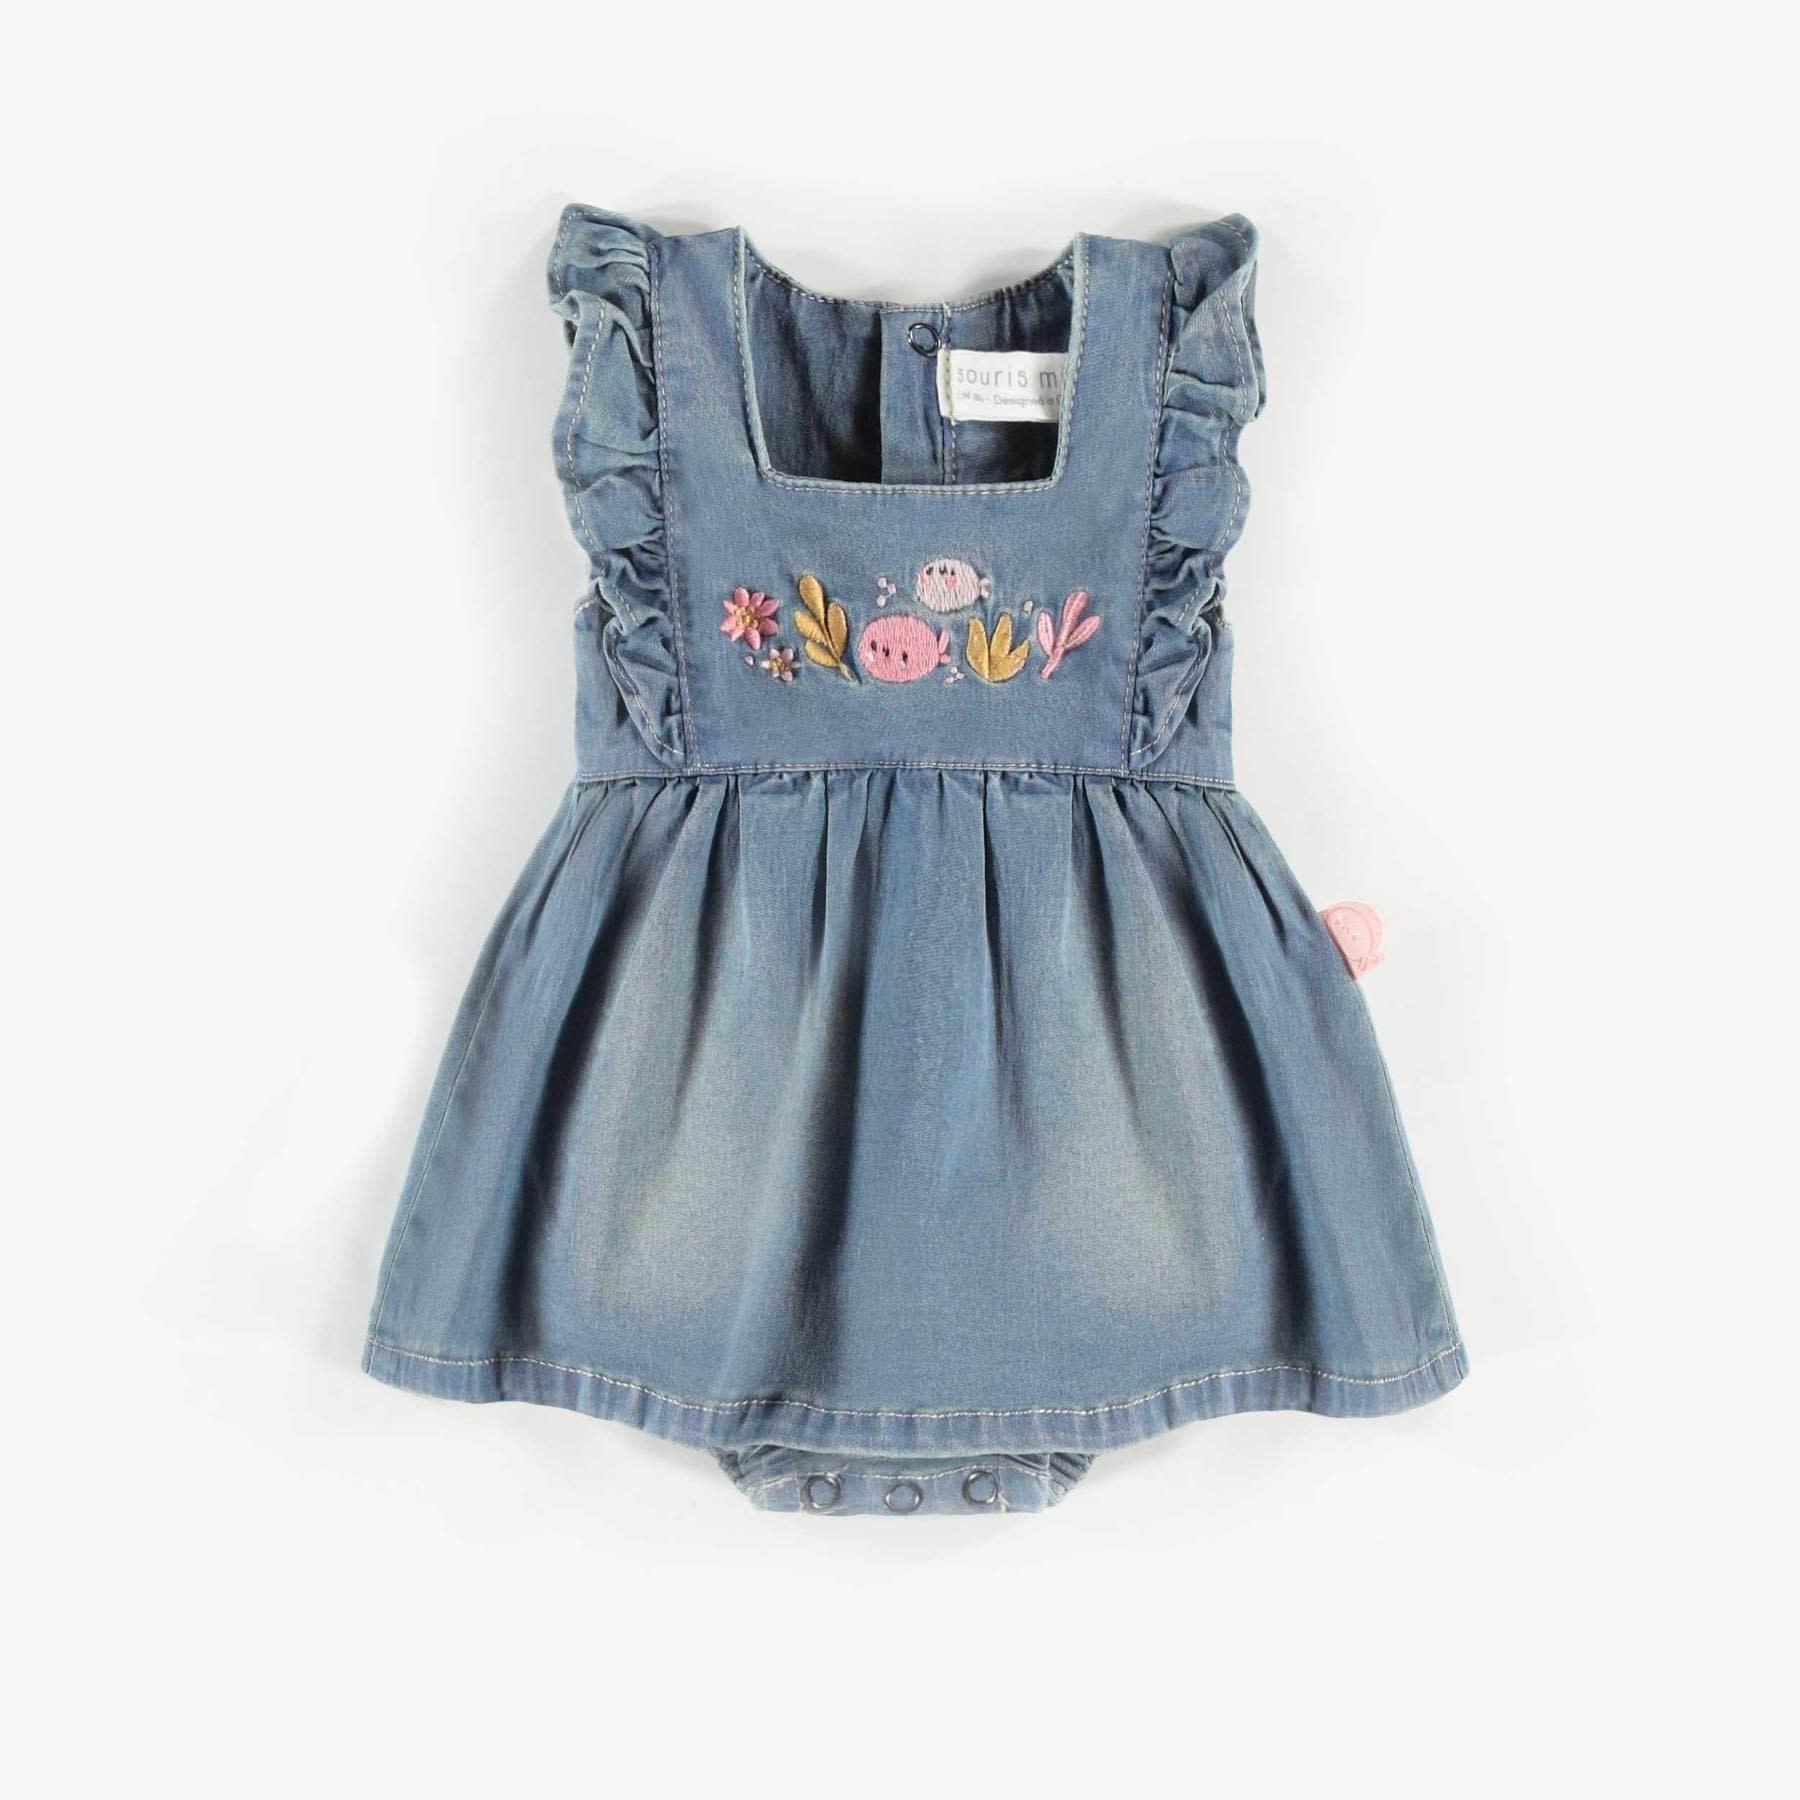 Denim Dress & Onesie with Leggings - 3pc Set